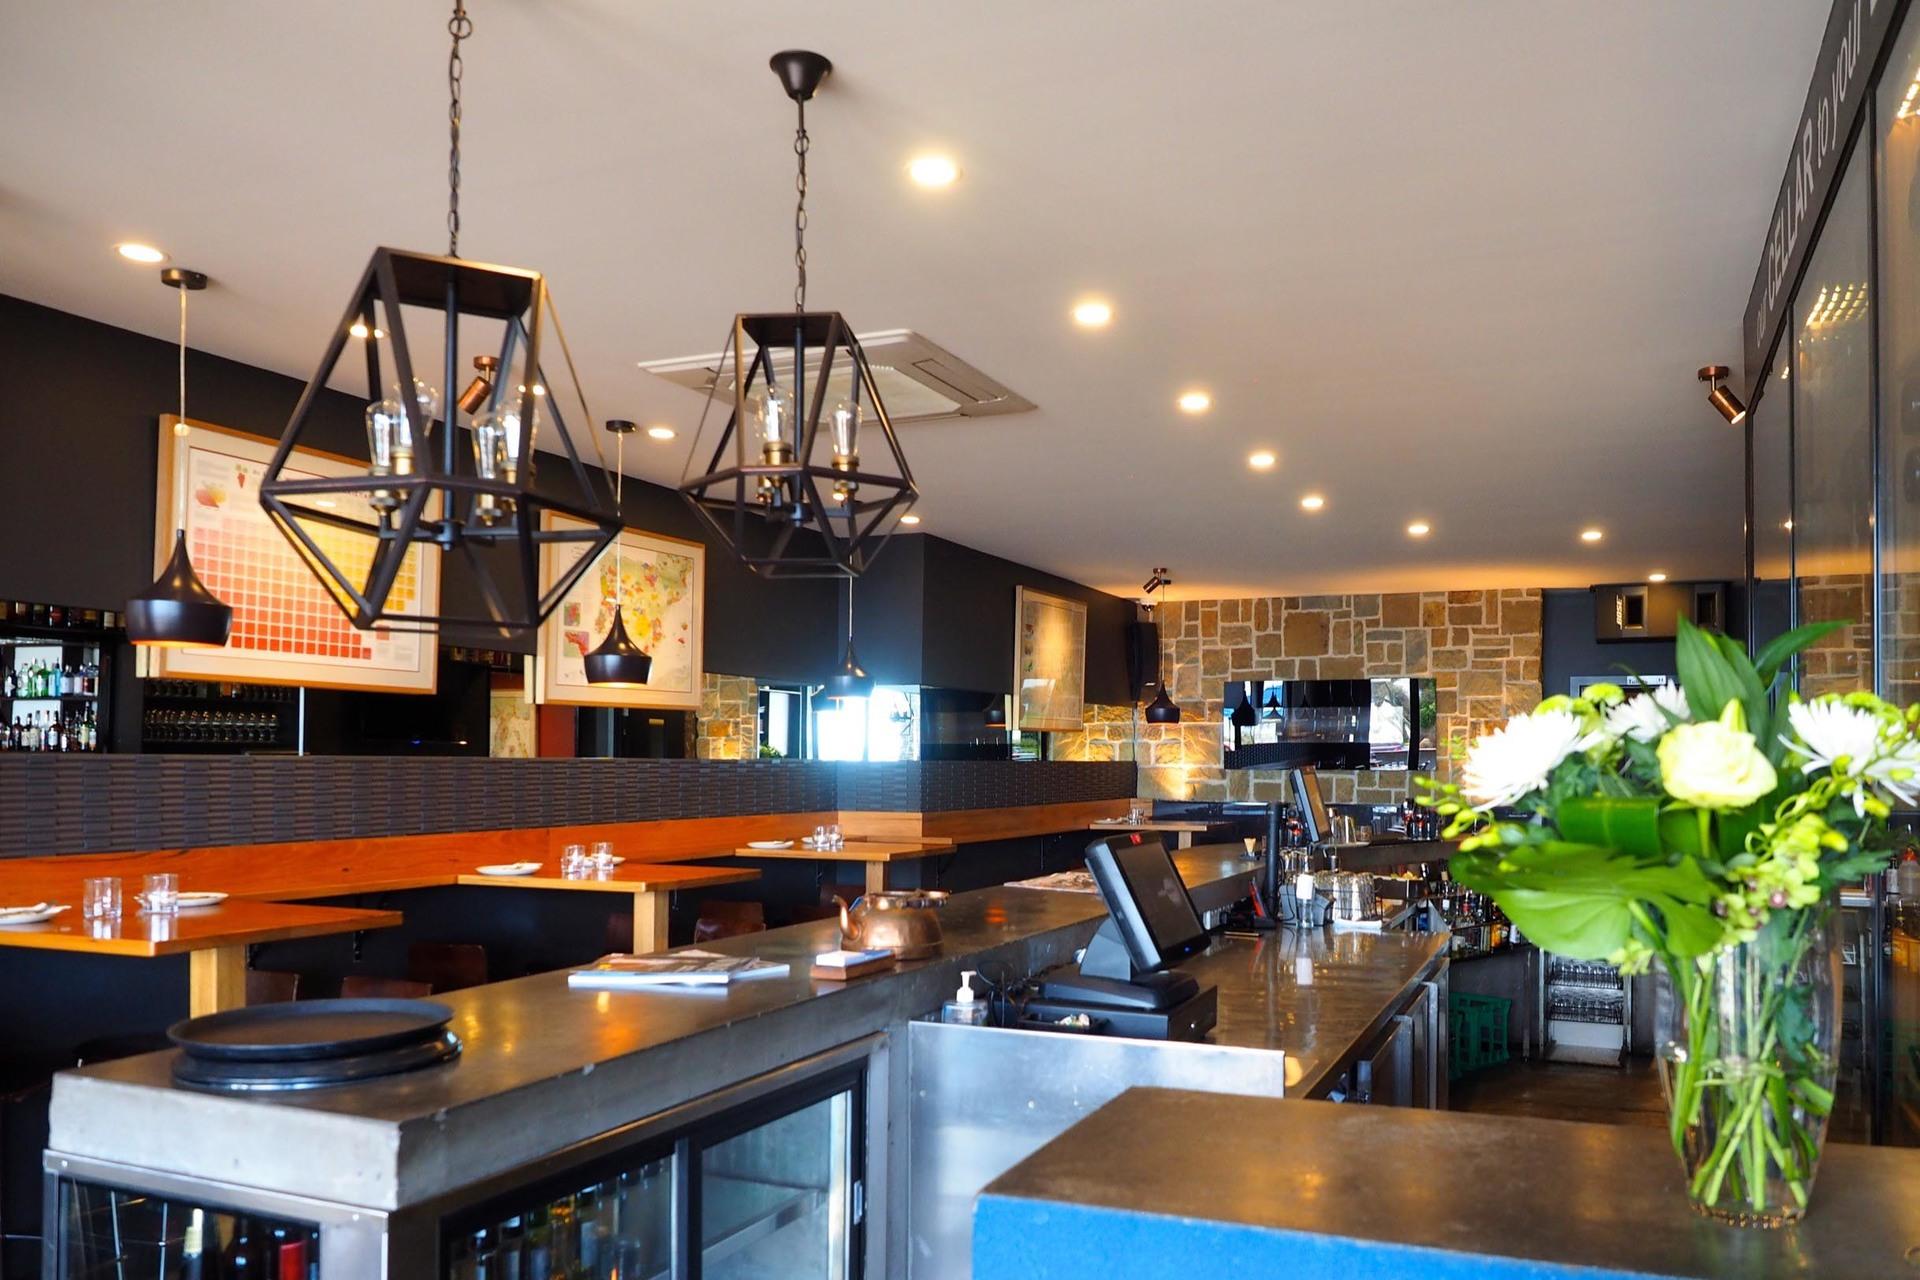 b - Two Buoys Tapas & Wine Bar